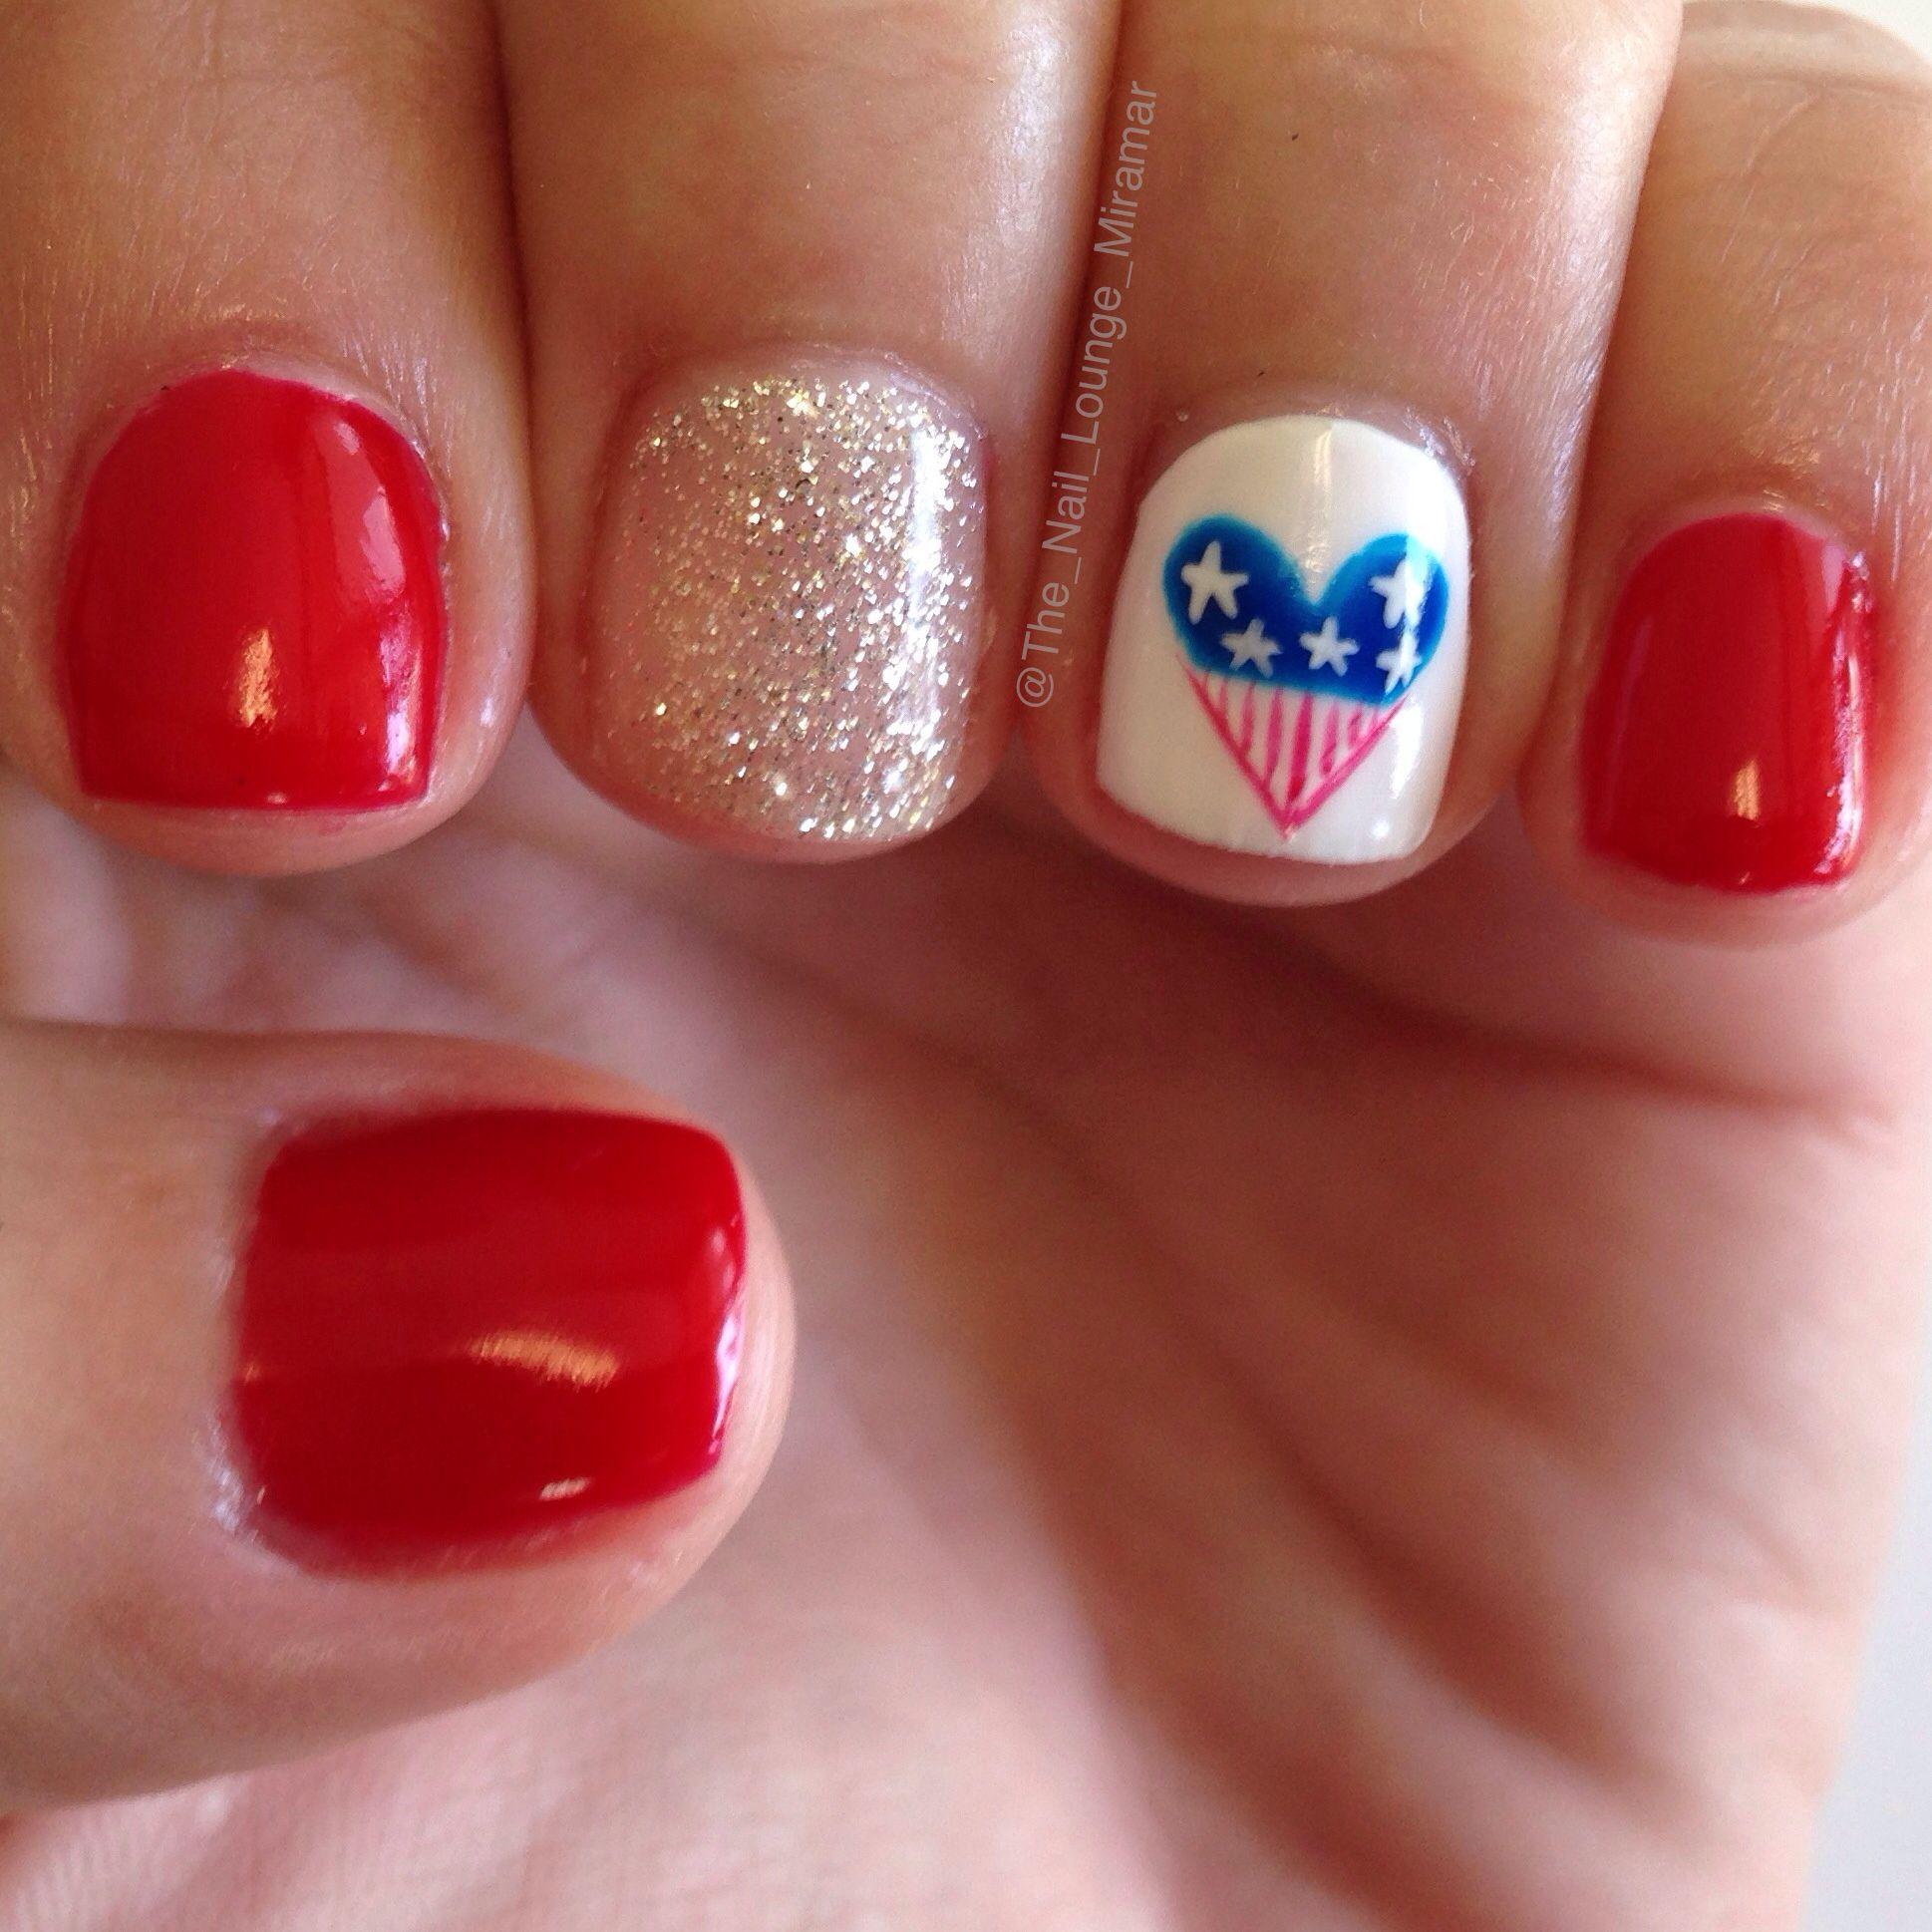 July 4 nail art design | Nail Art | Pinterest | Makeup